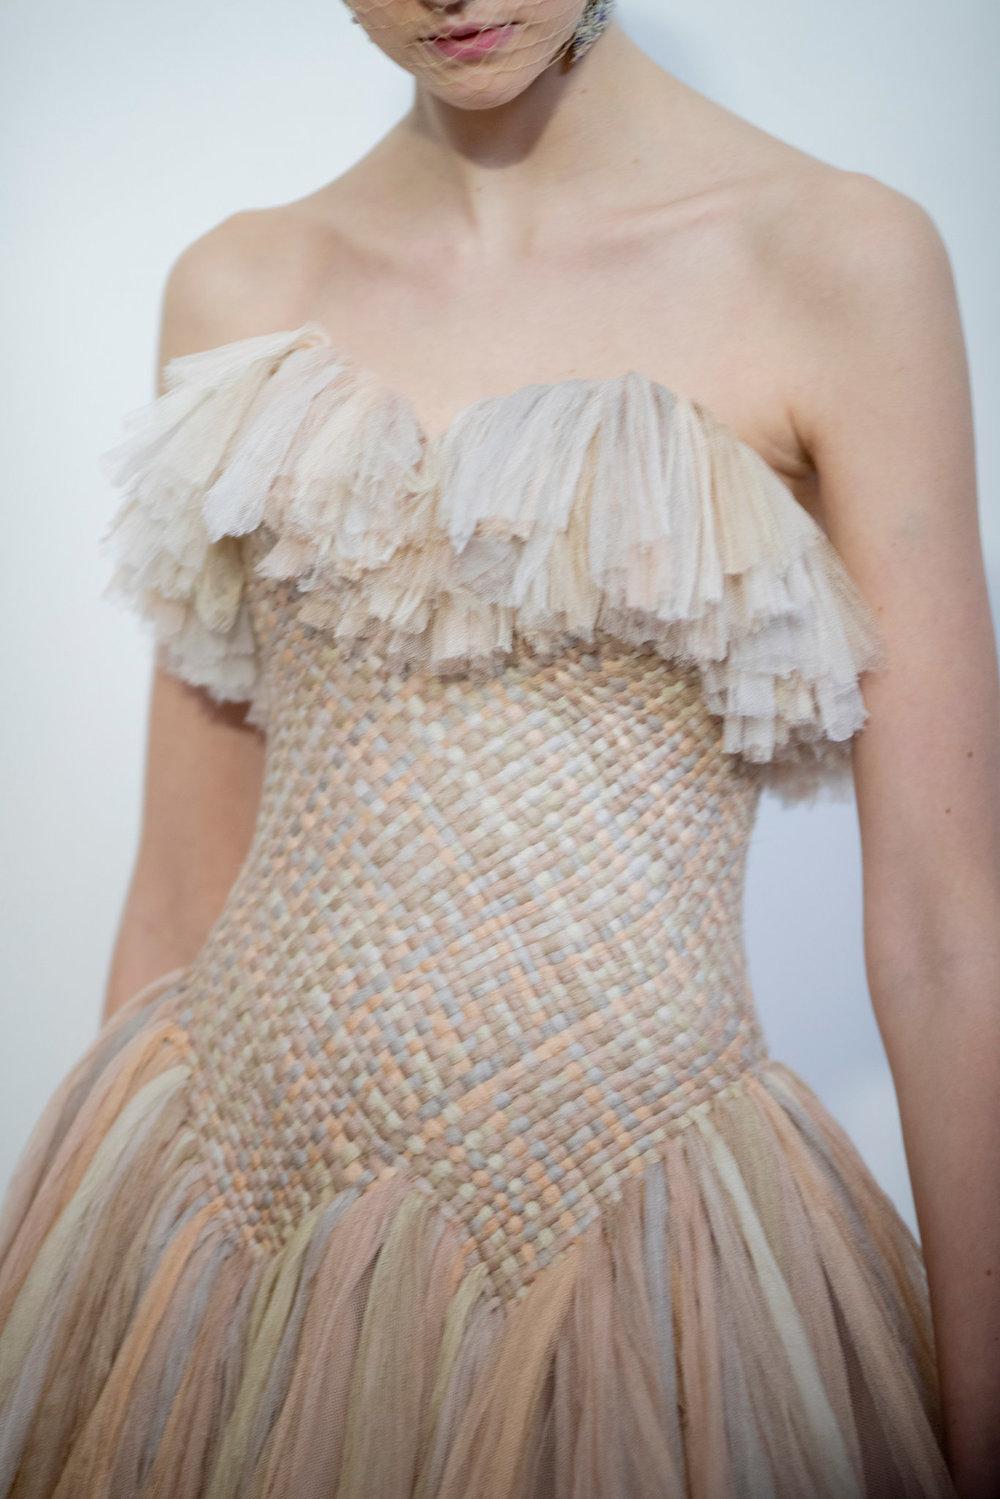 Couture-slide-6YIN-superJumbo[1].jpg